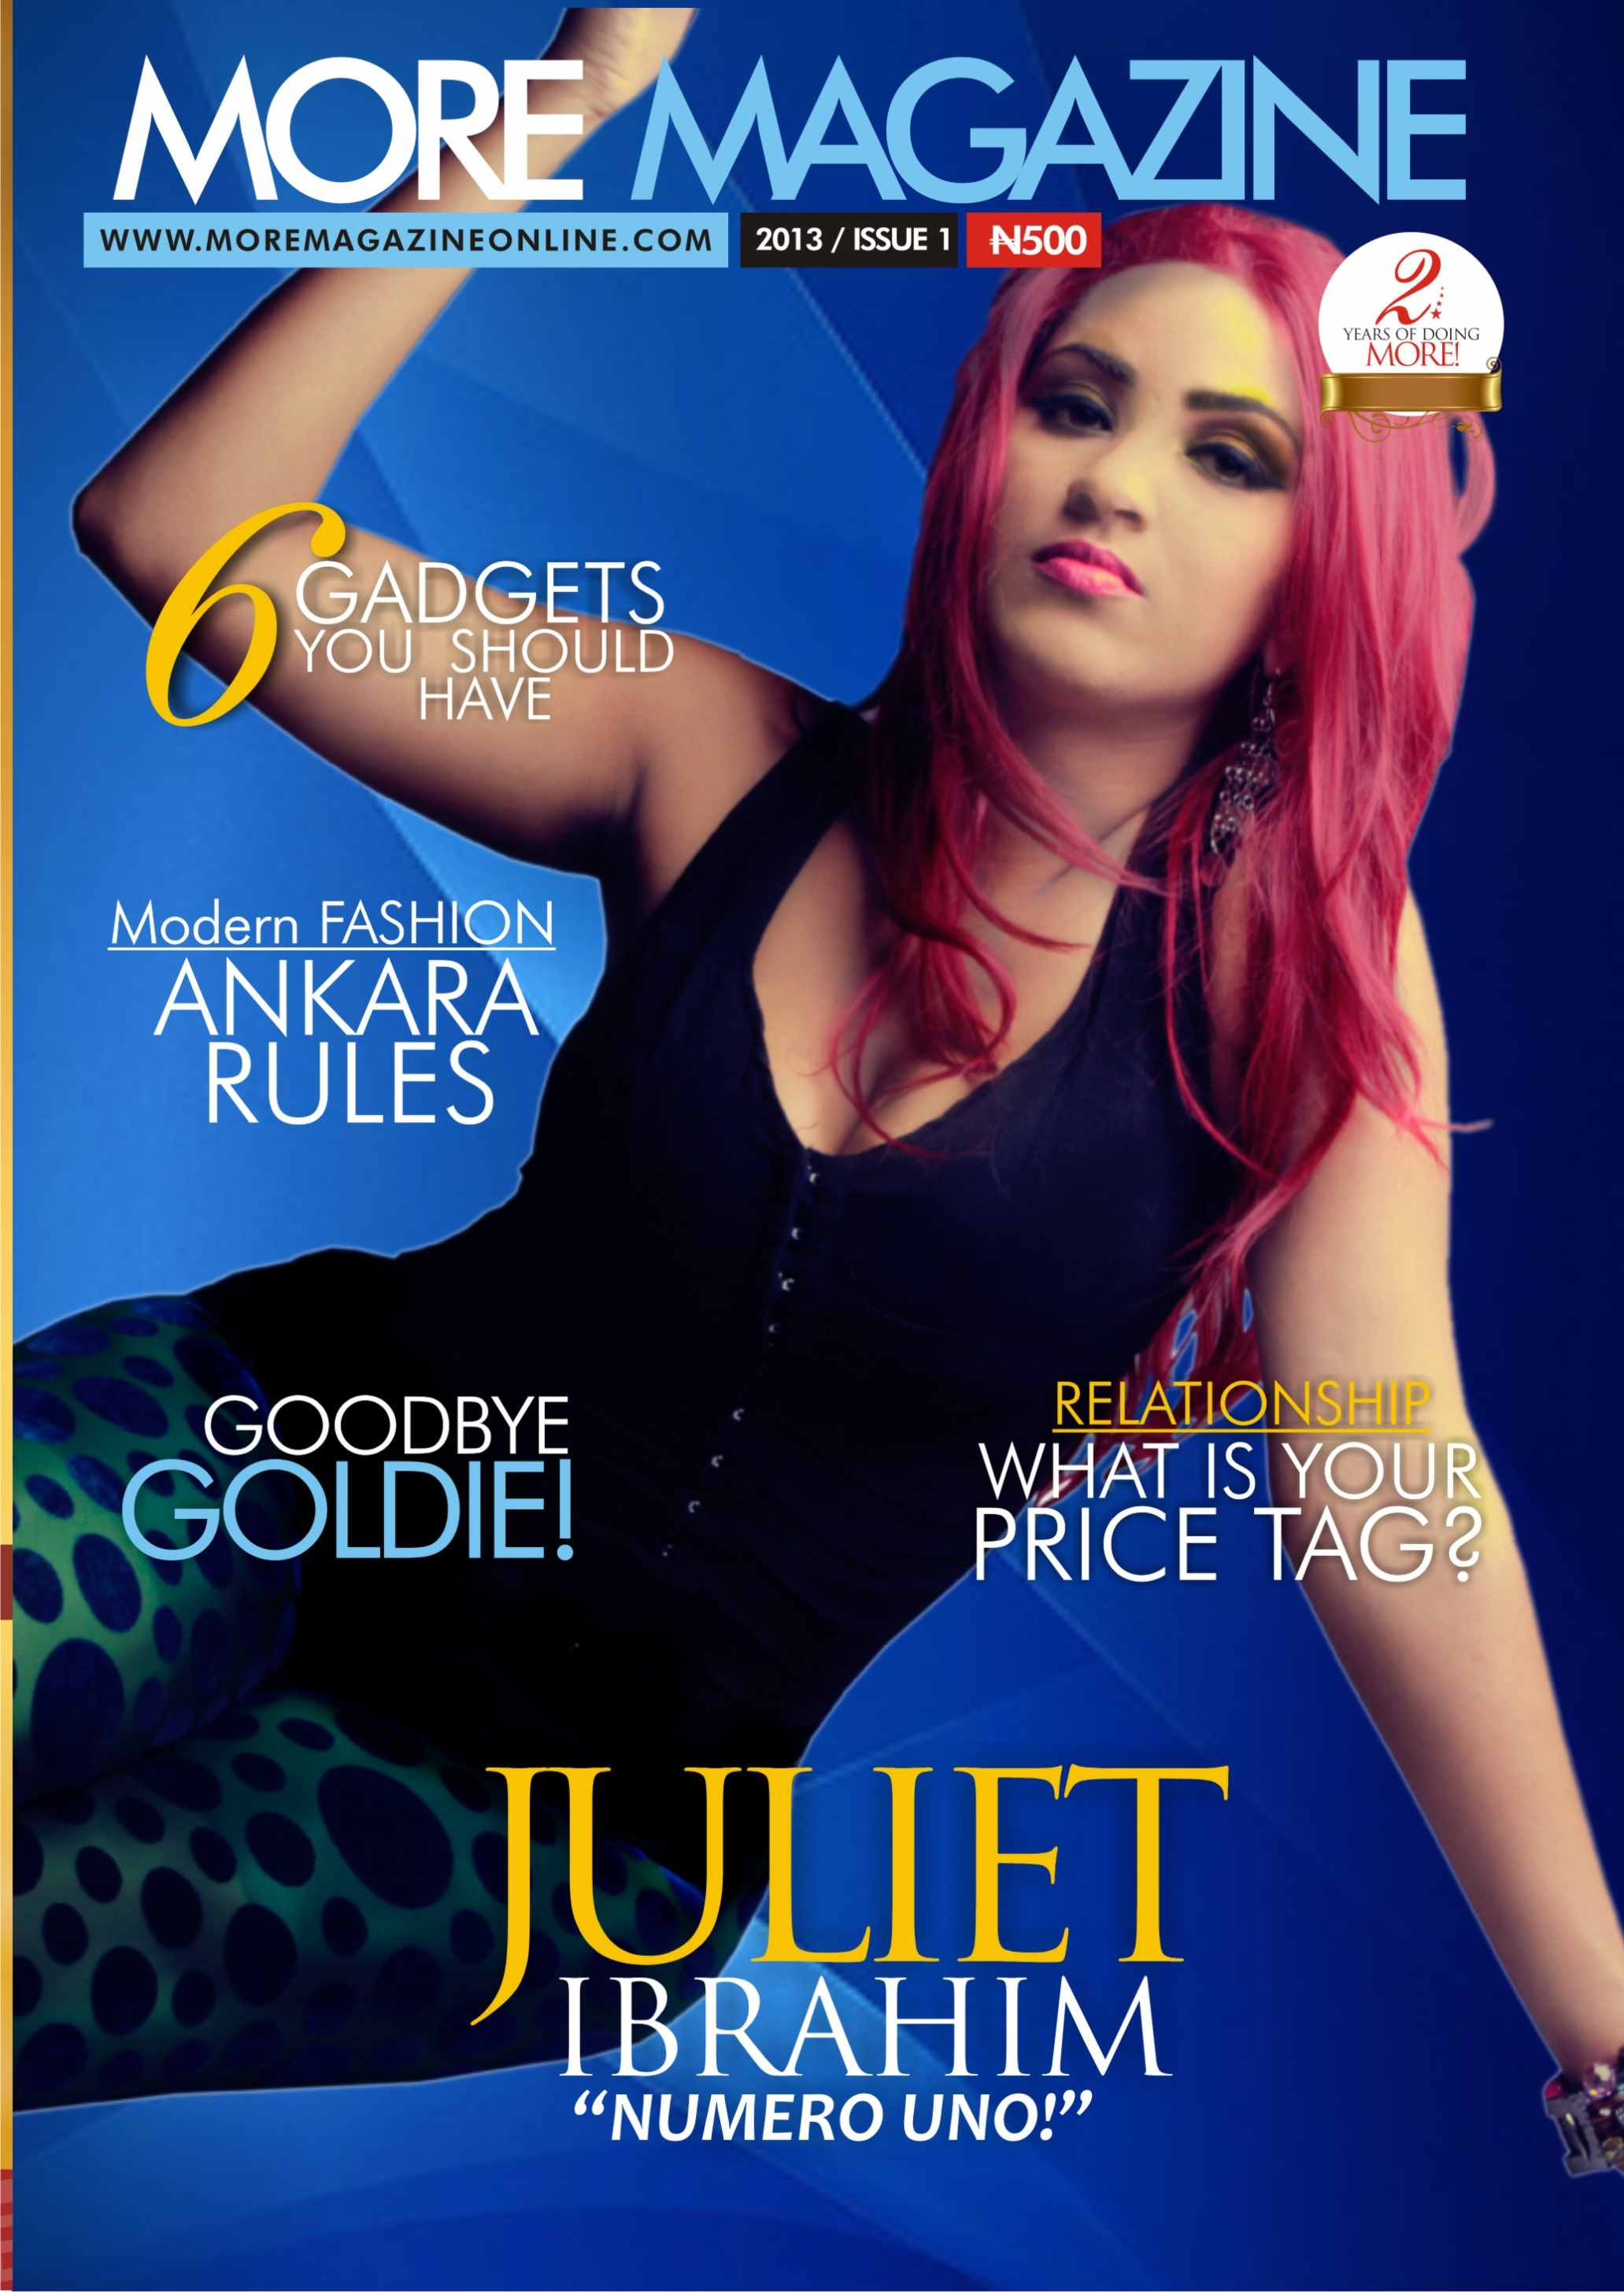 Ghanaian Movie Star Juliet Ibrahim Rocks Pink Hair! Check